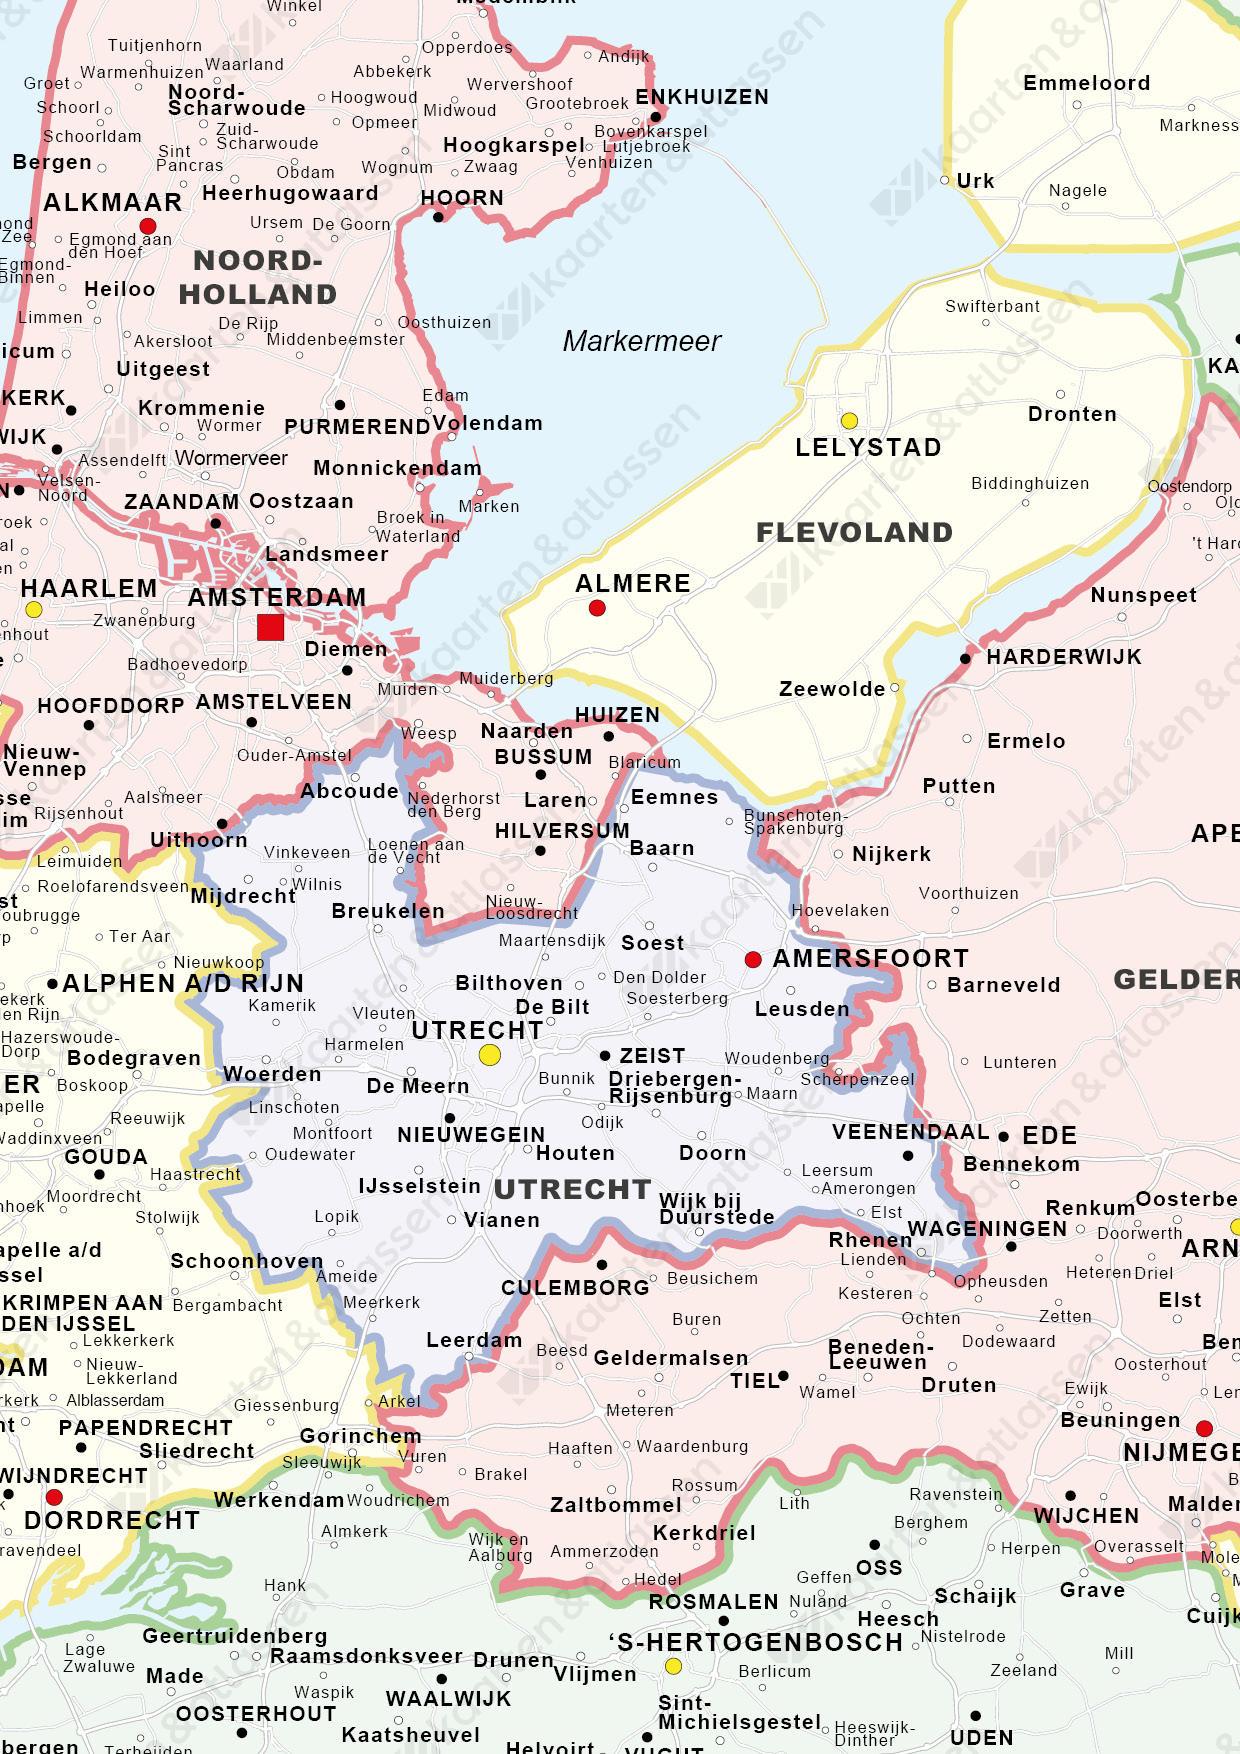 https://www.kaartenenatlassen.nl/modules/file/icons/image-x-generic.pngDigitale Frisse Landkaart van Nederland